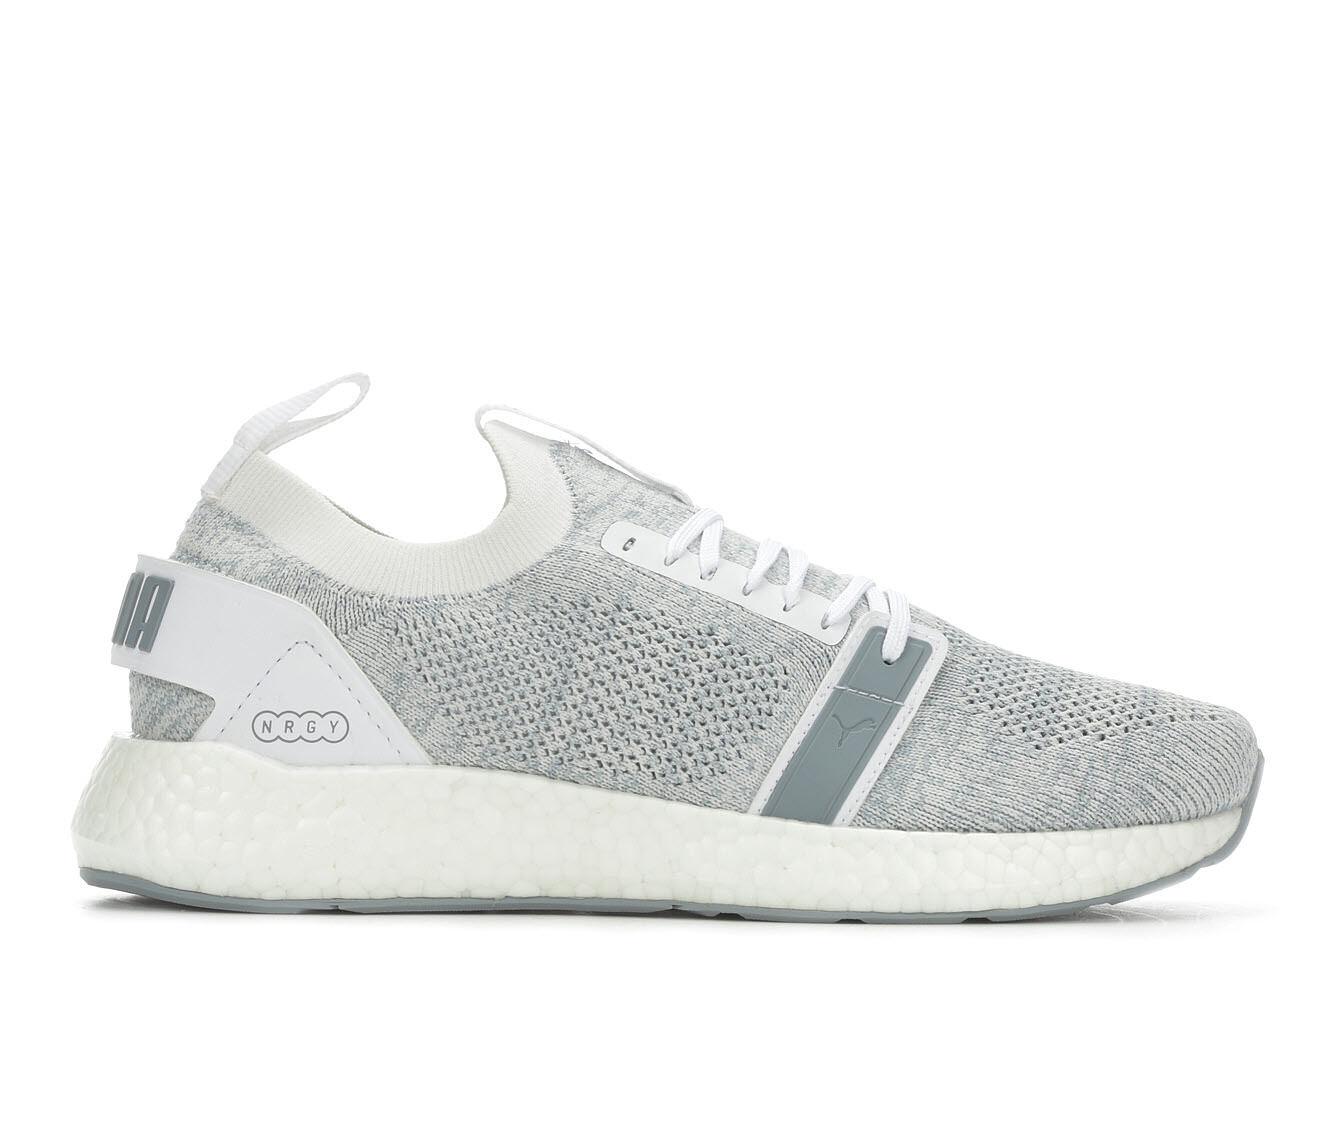 407d2bdcd224f8 ... buy puma nrgy neko engineer slip on sneakers. previous 05e08 6bcb9